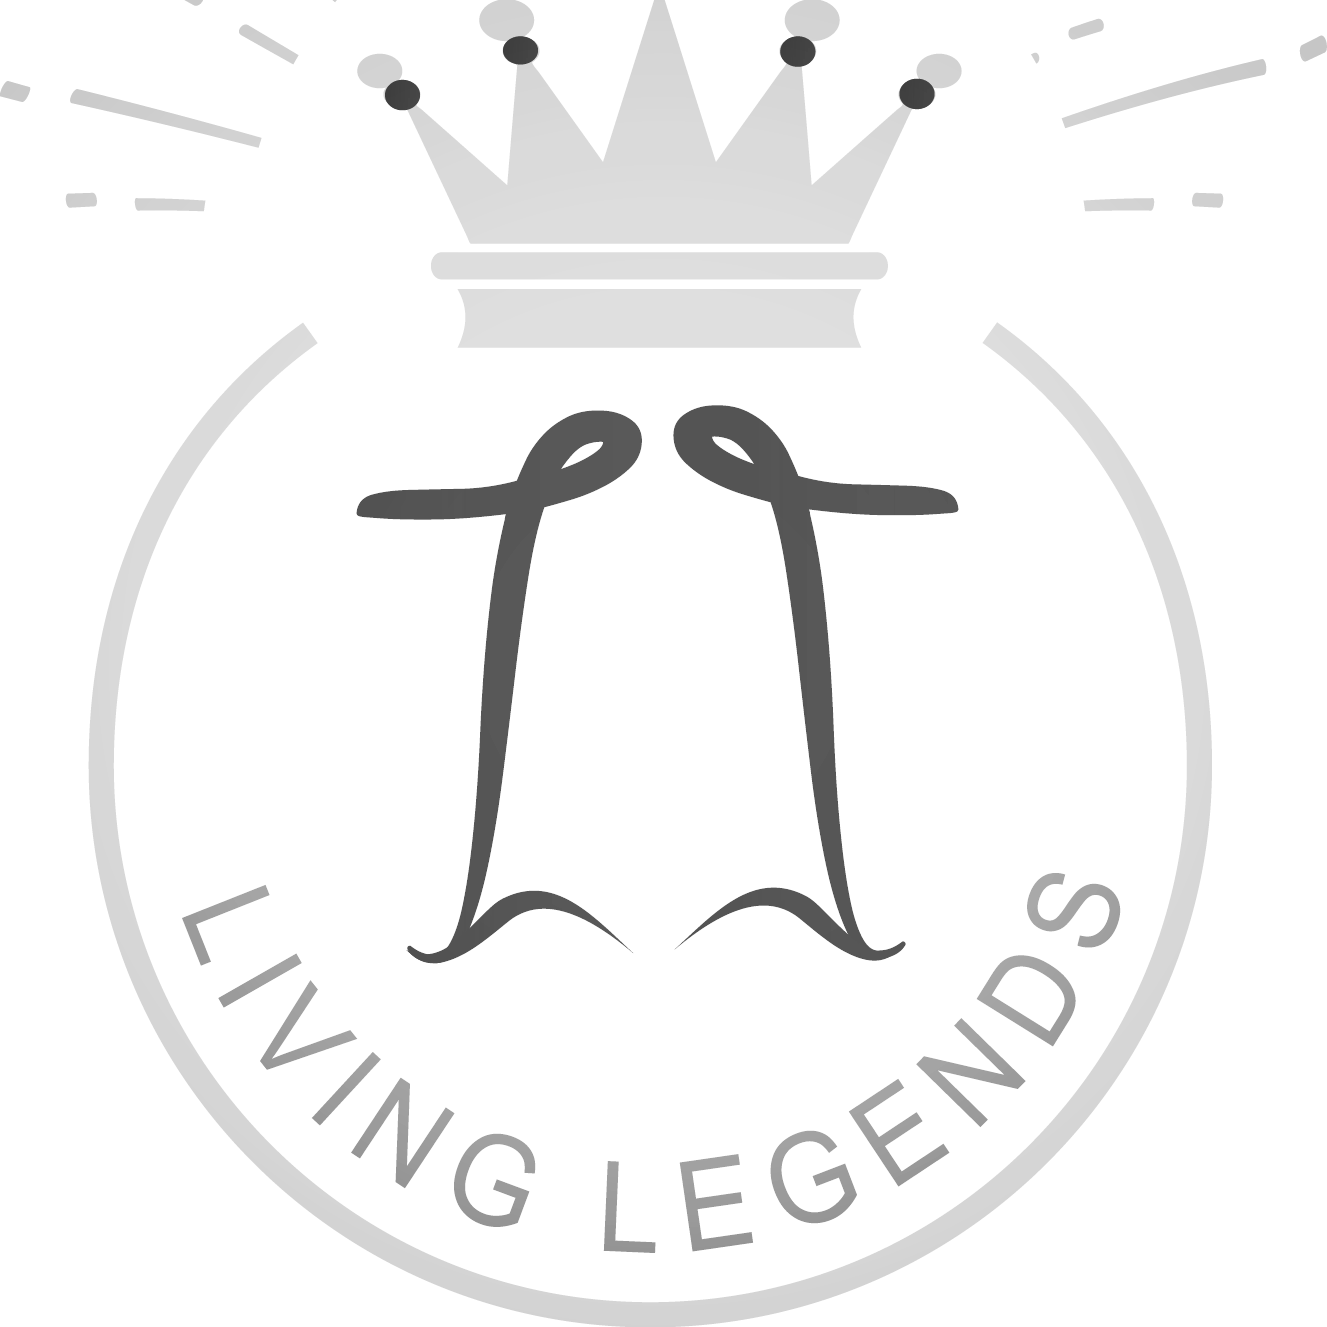 NONPROFIT - Living Legends - Danielle MAtthews, FOunder & president